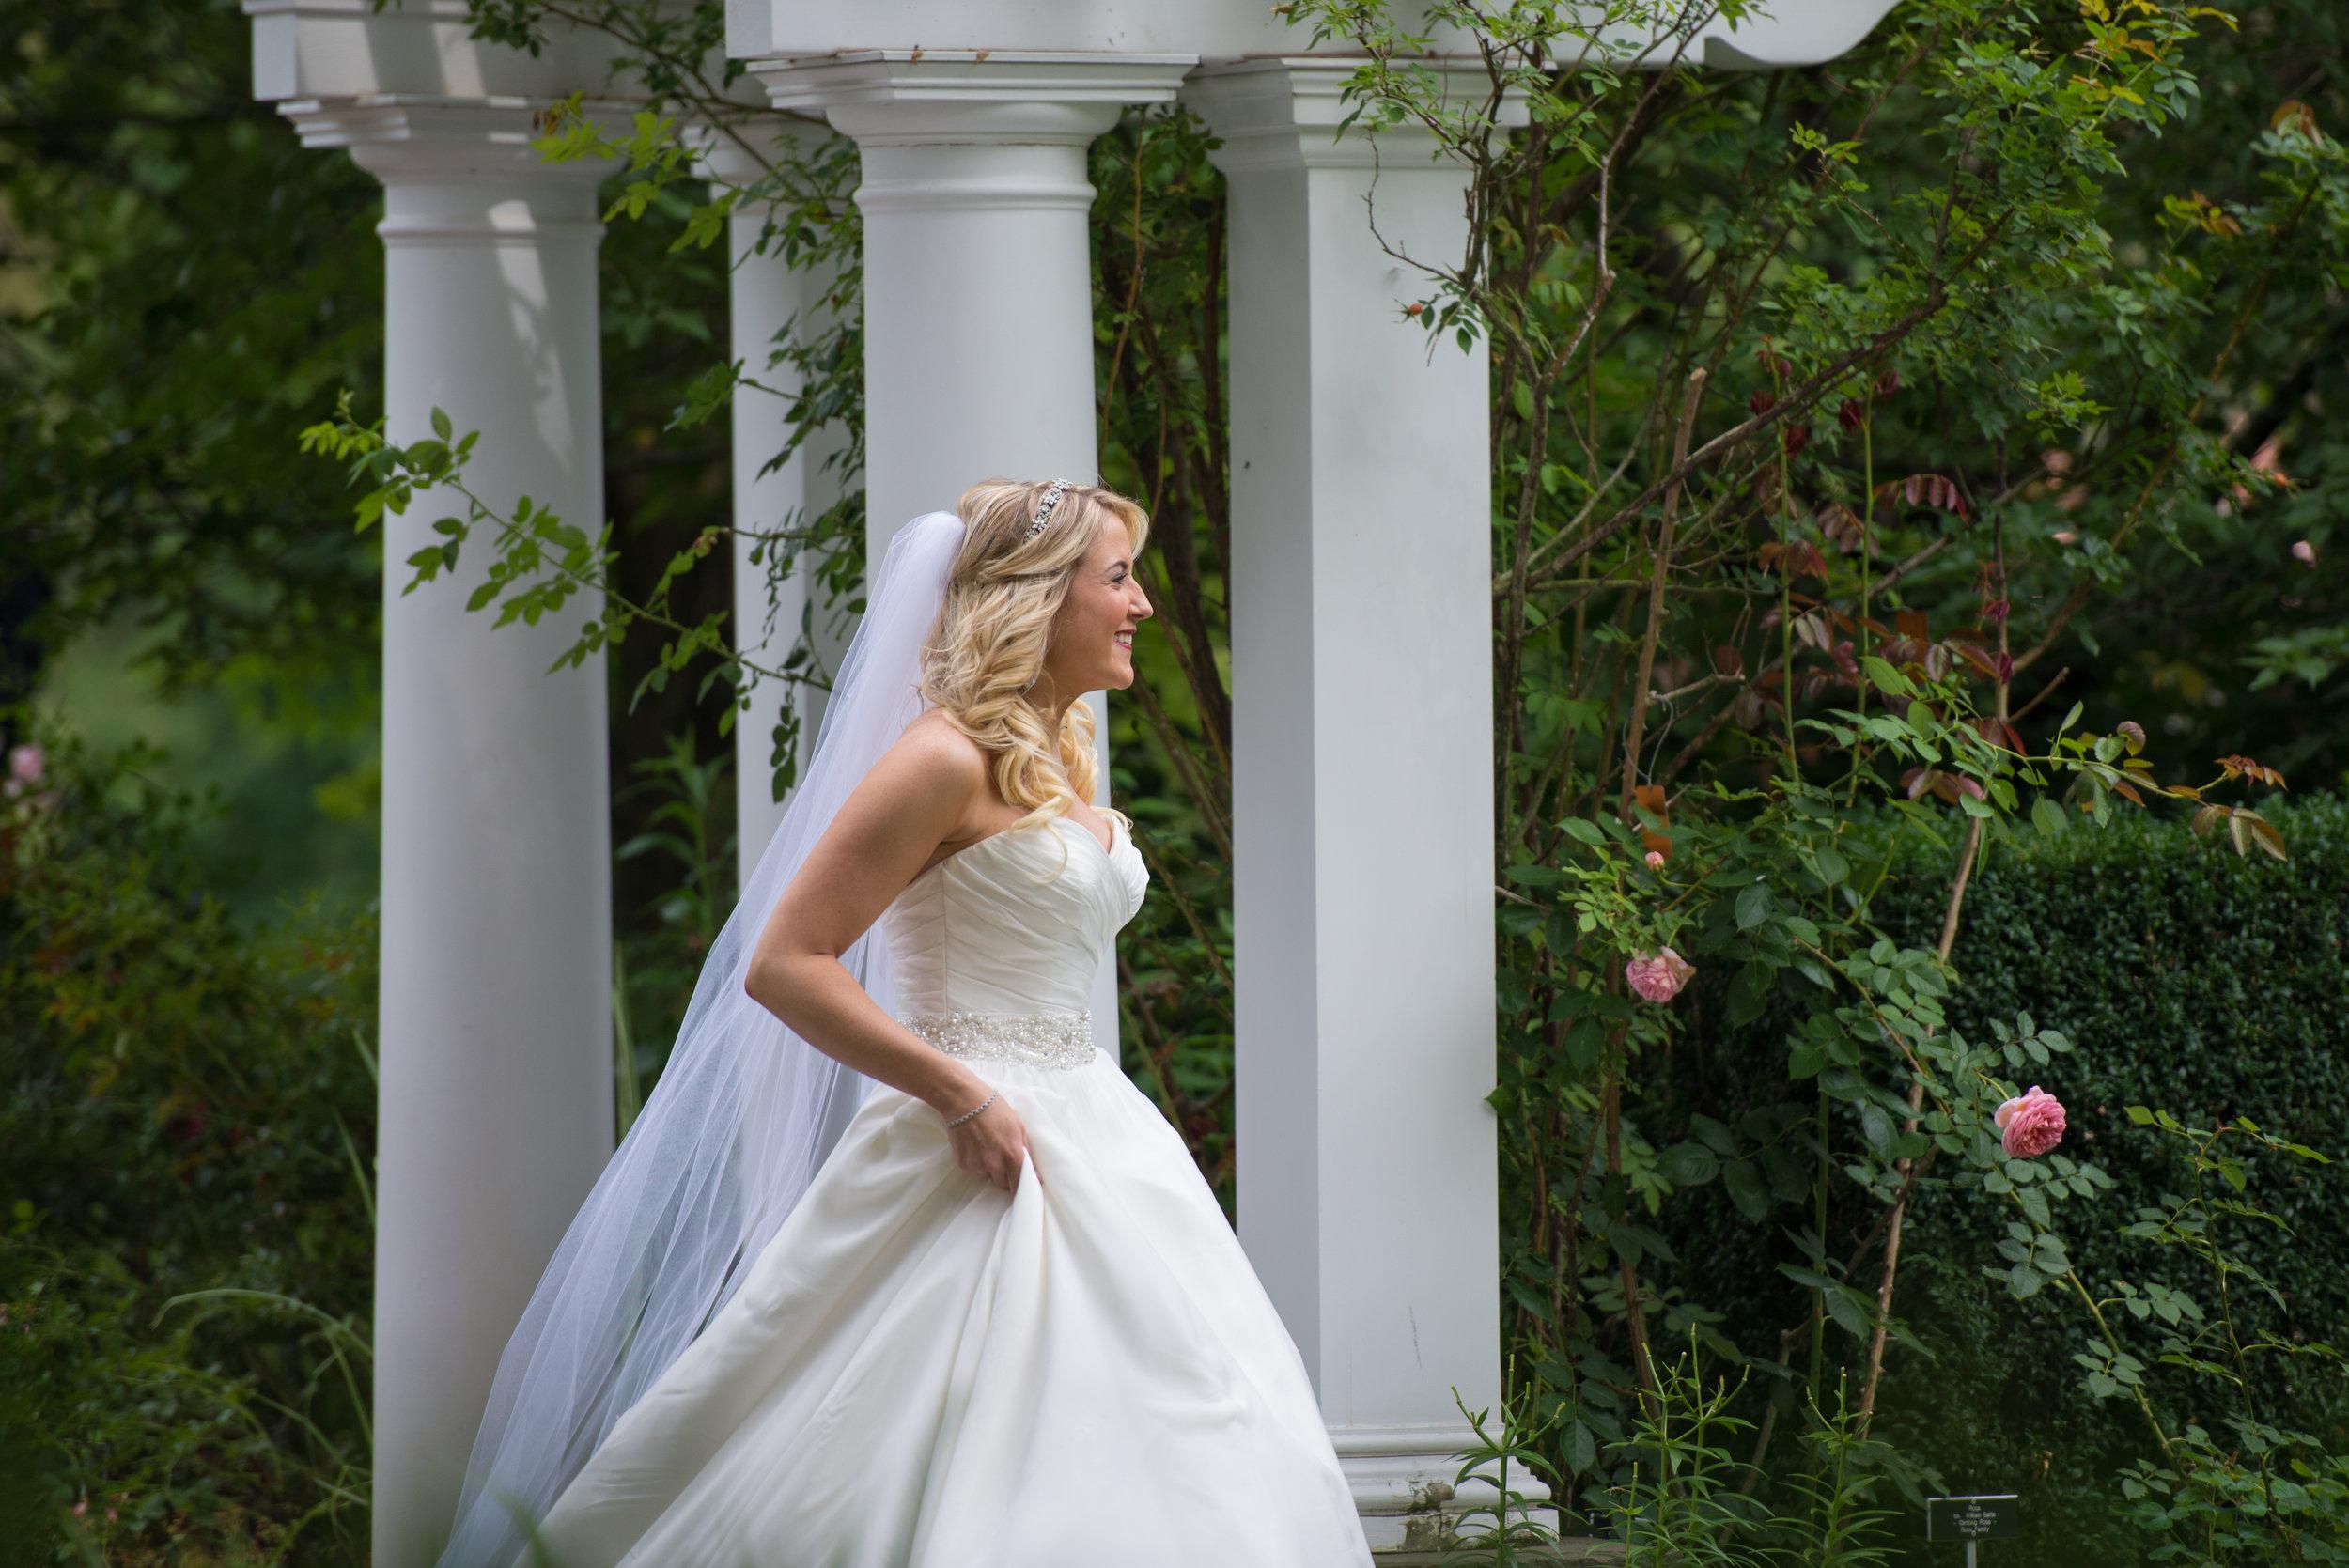 Wedding First Look Photos00913.jpg